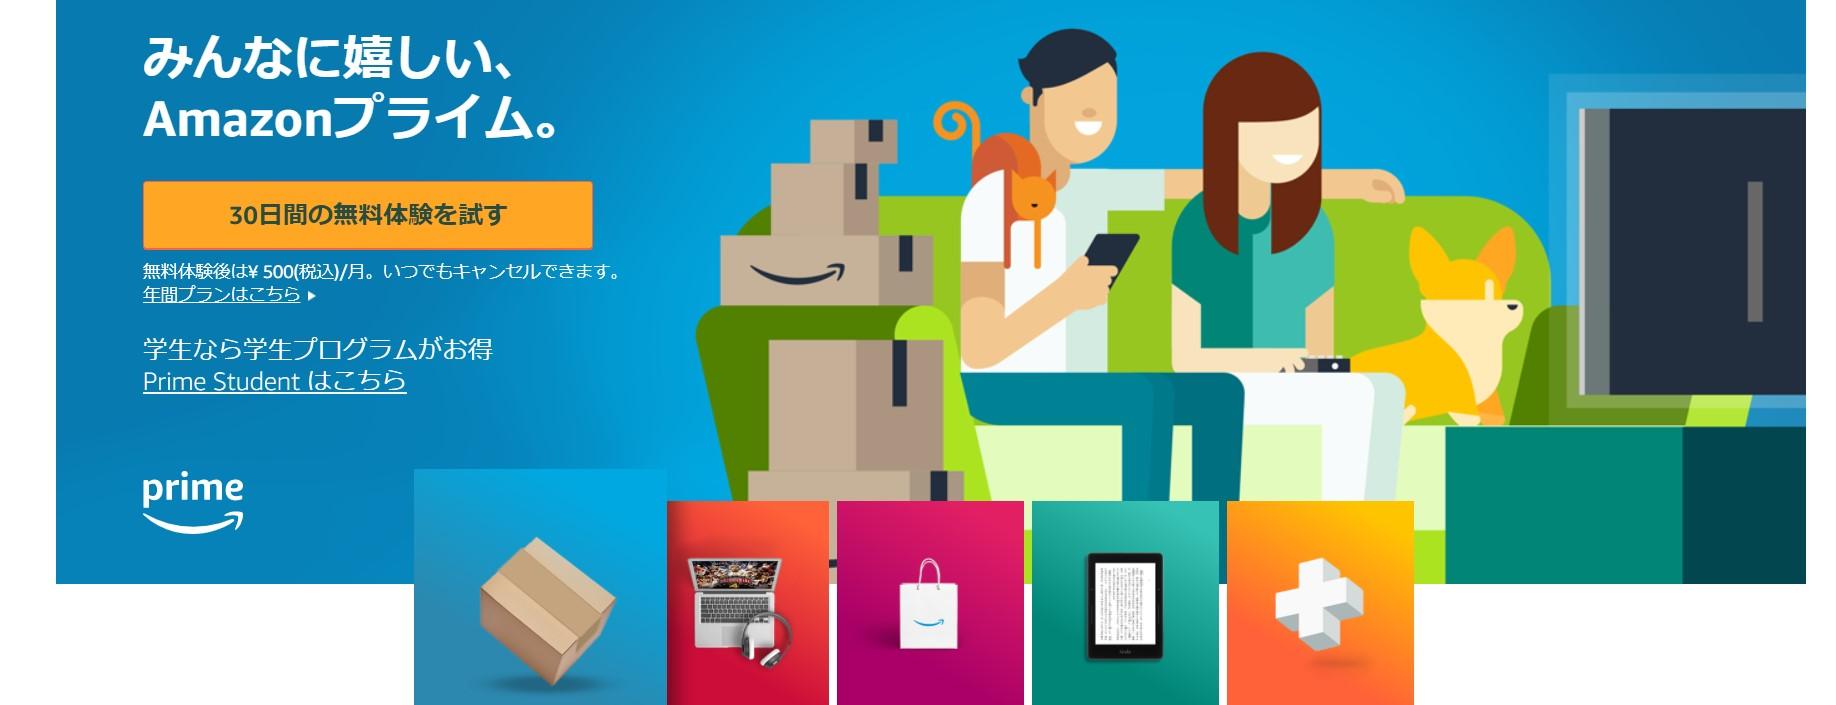 Photo of 日本亞馬遜Amazon Prime會員是什麼?9項優惠有哪些?為什麼每月500日幣超值得?